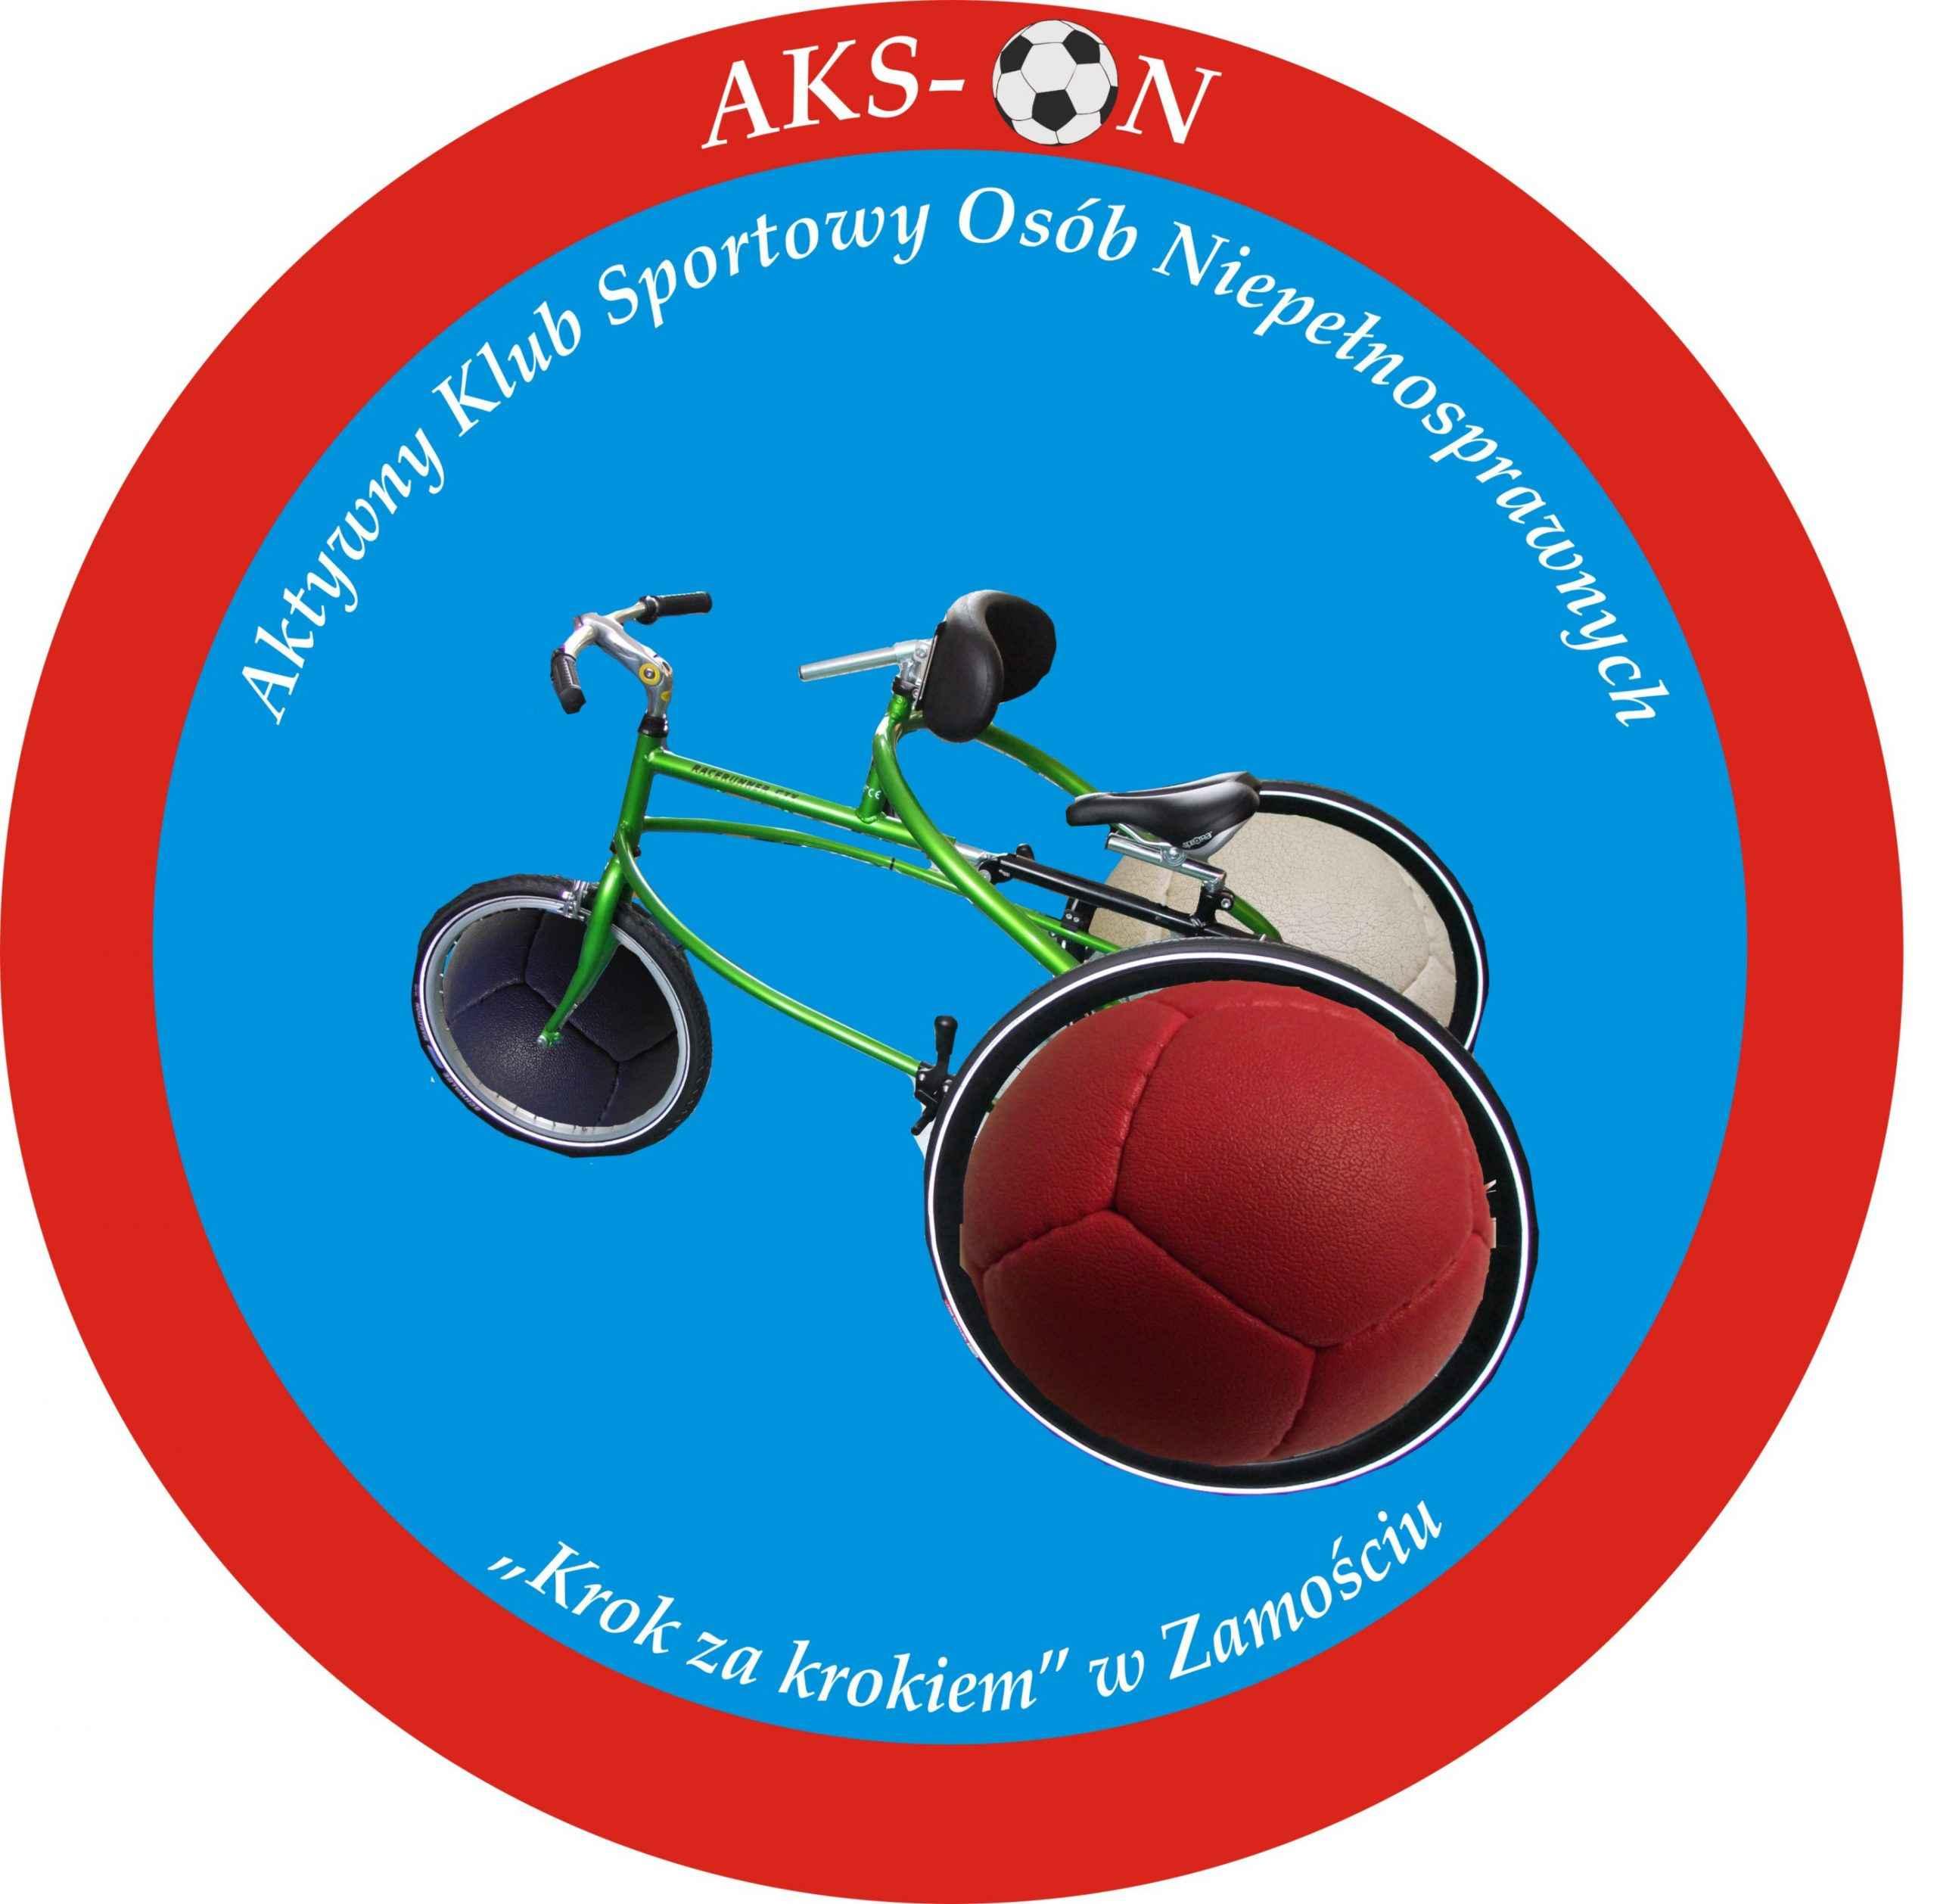 Klub Sportowy AKS-ON